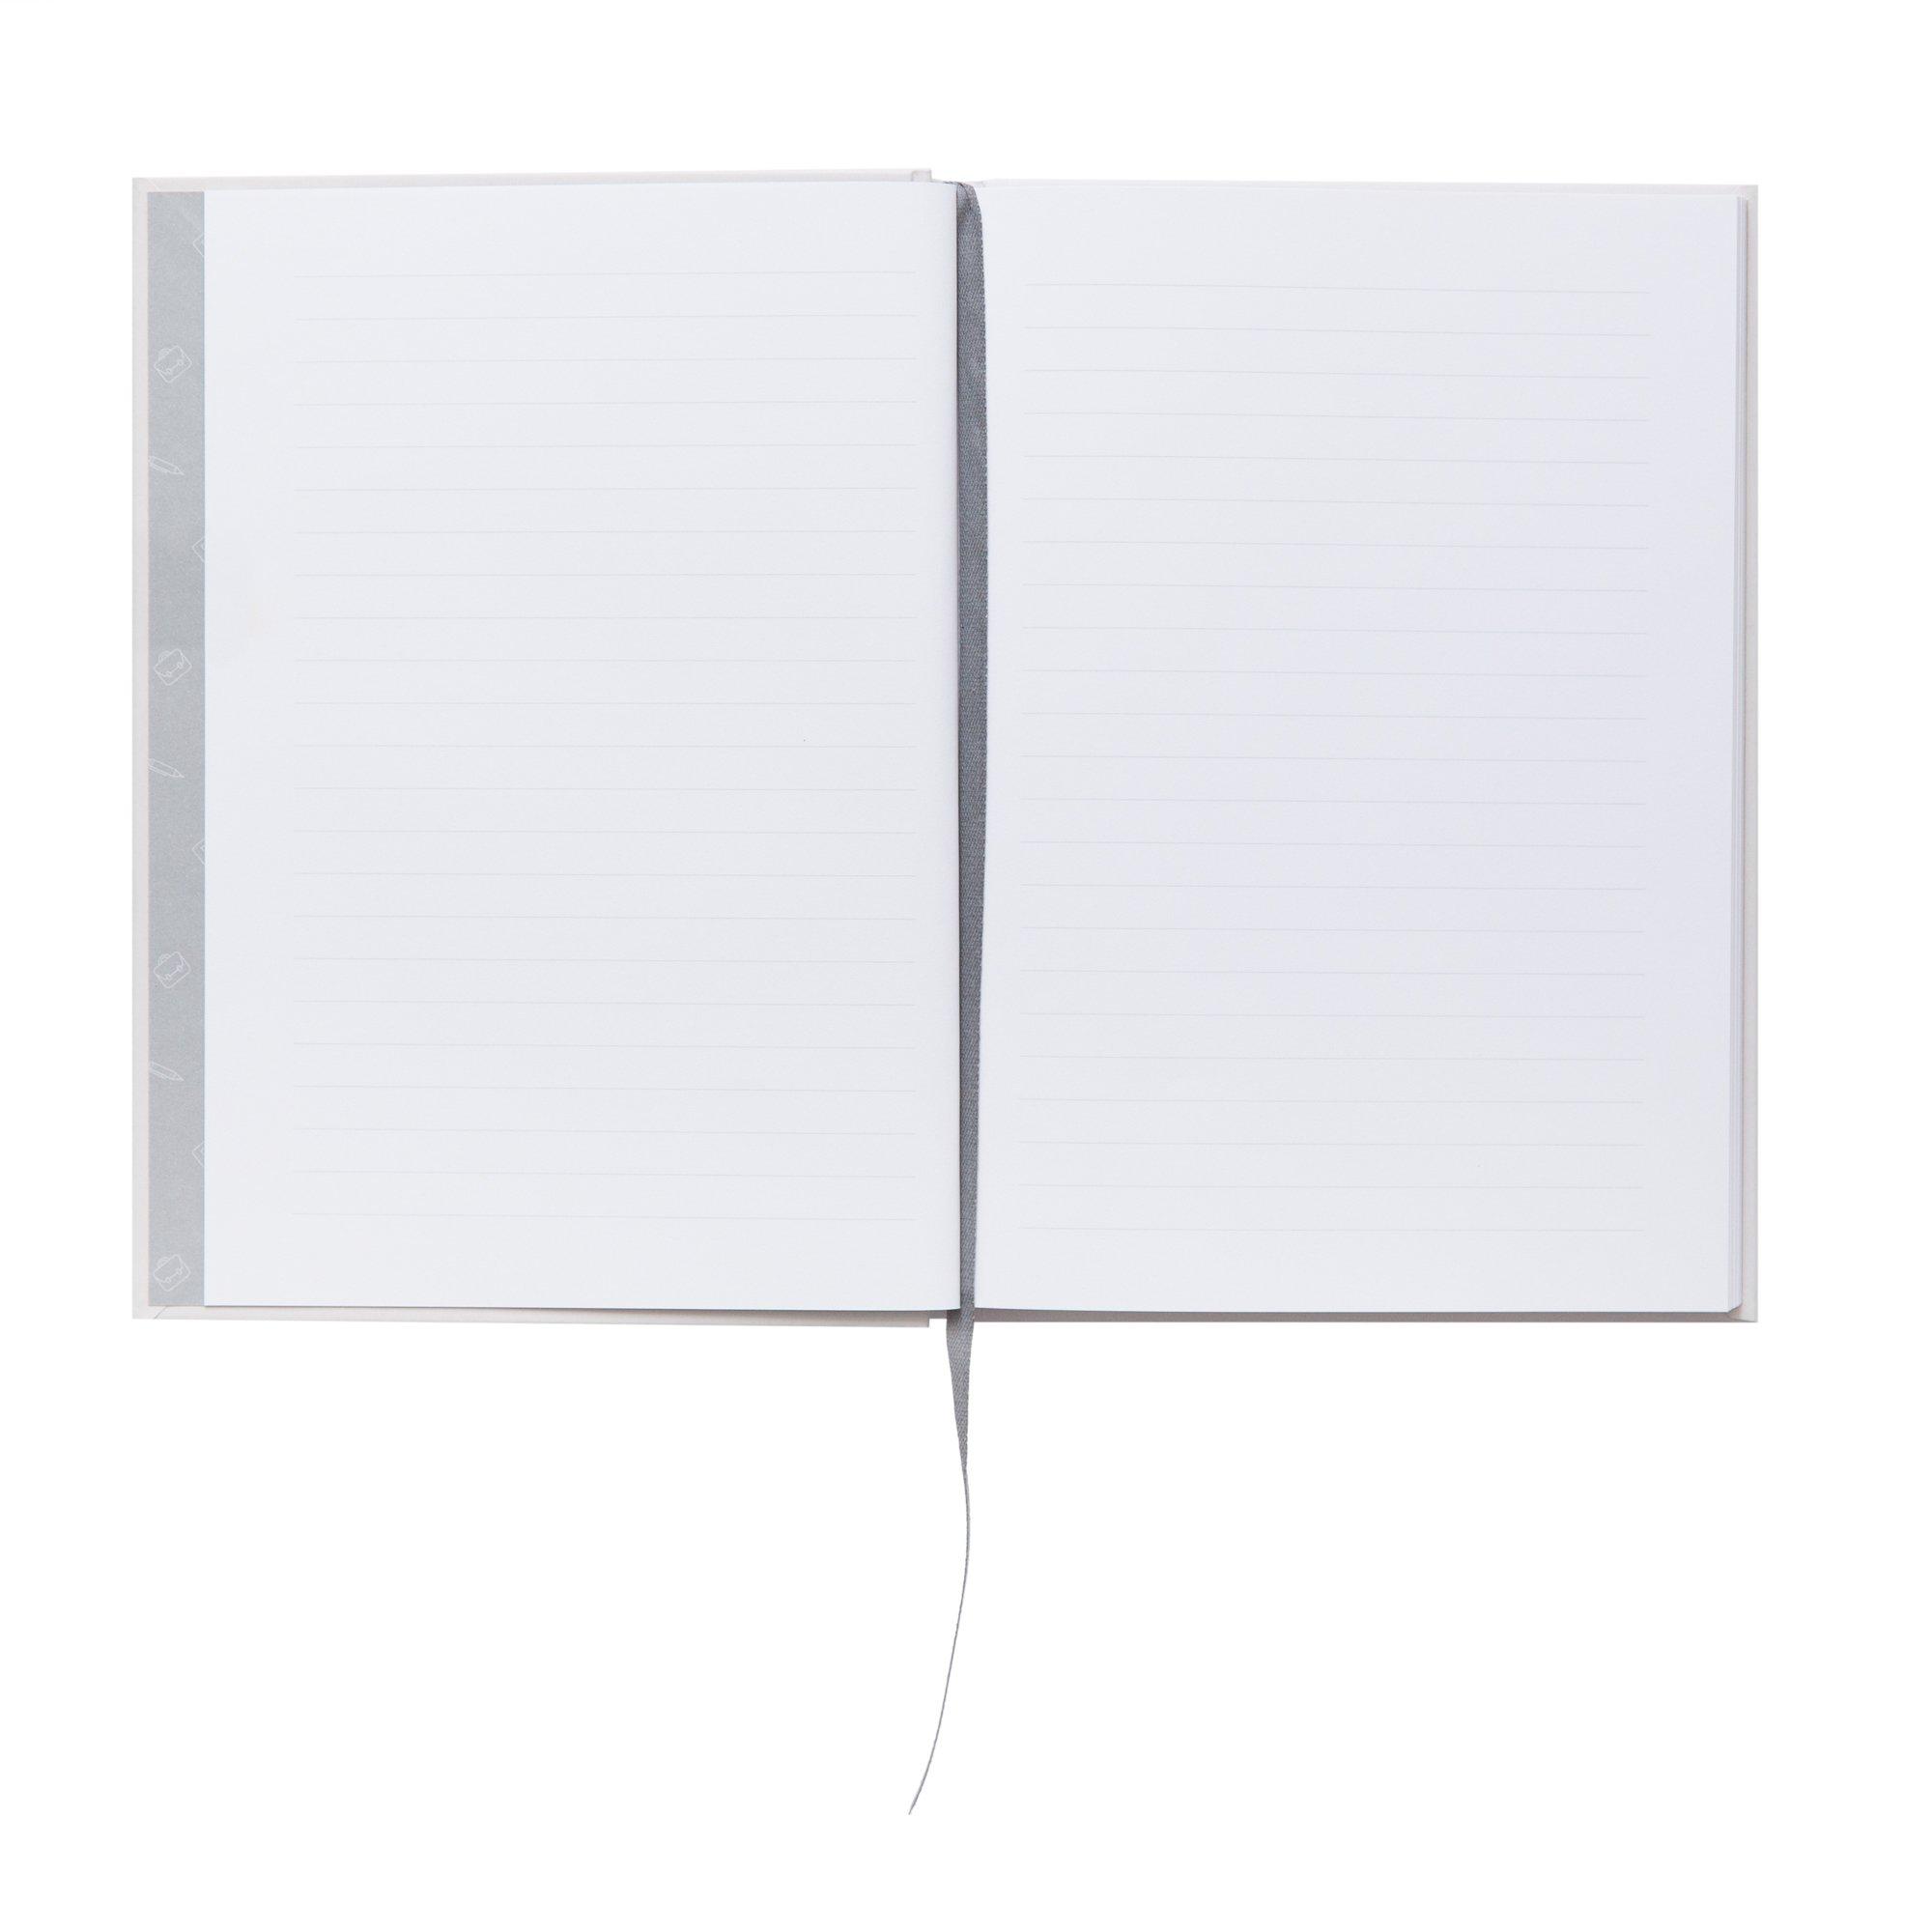 Mr. Wonderful woa08497fr Notebook-Prof, wirklich Top